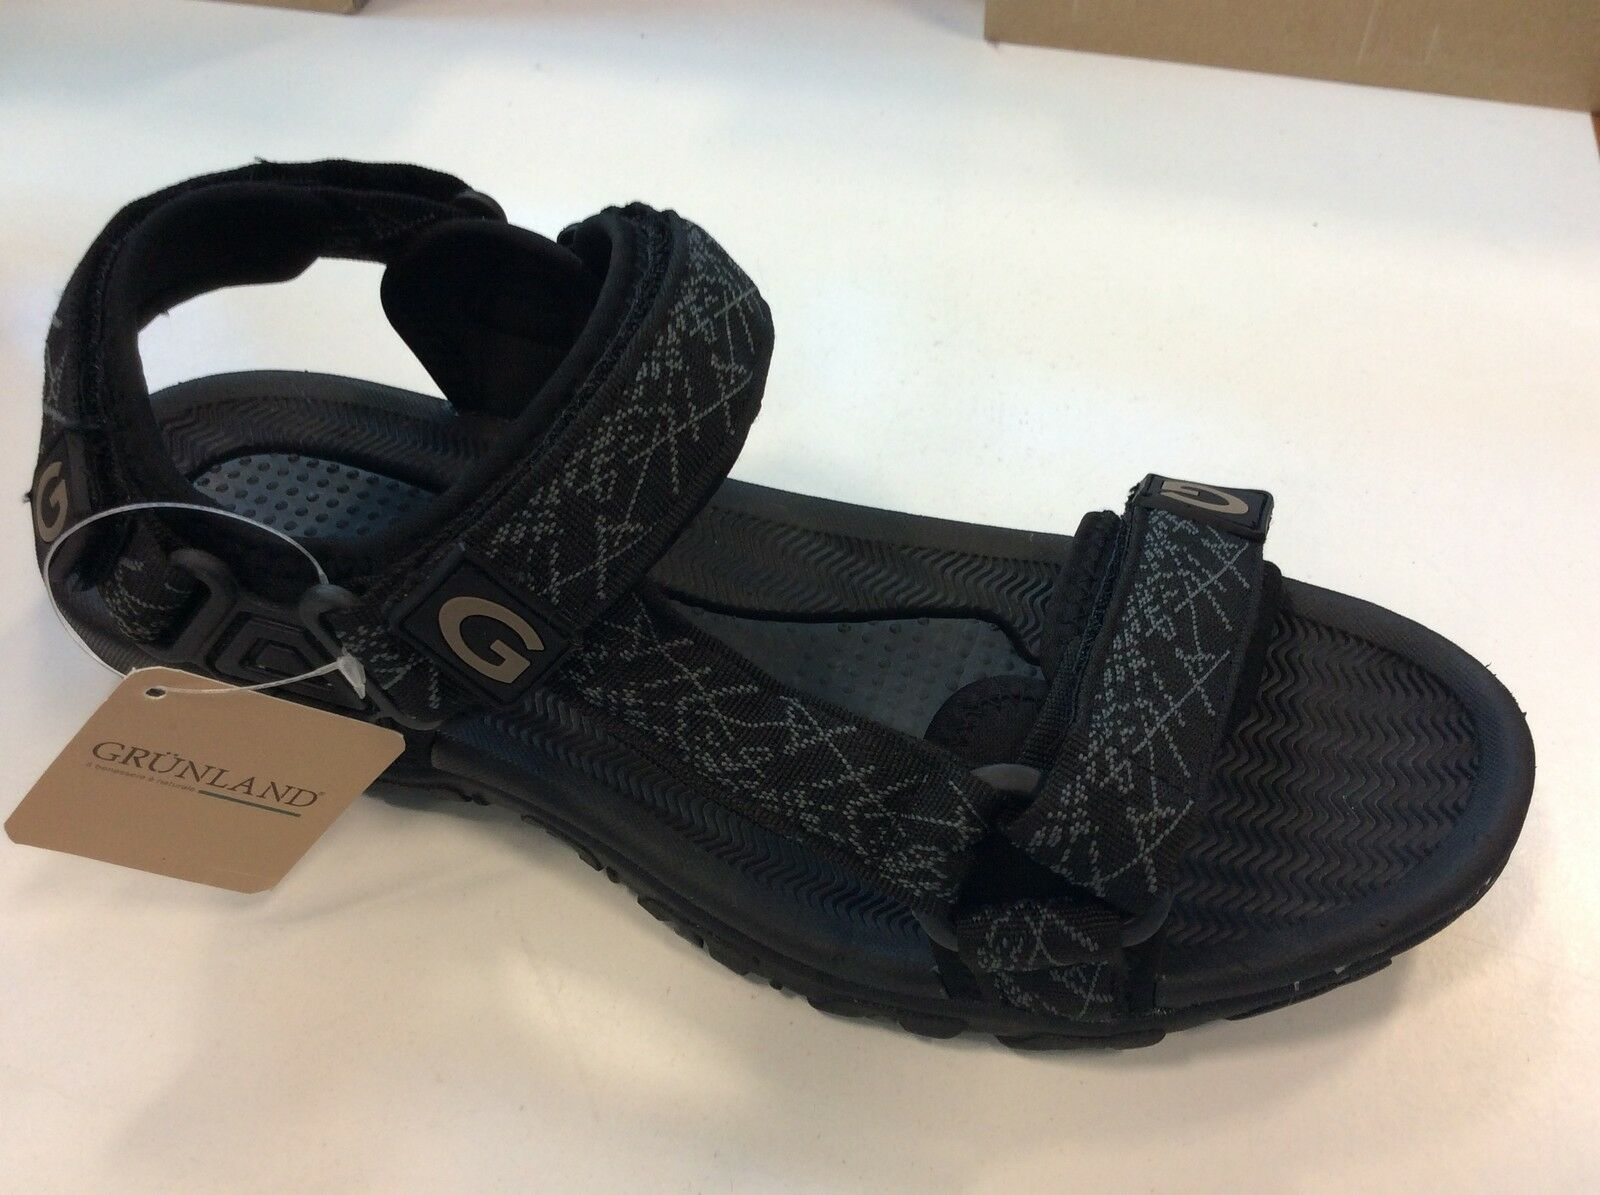 Sandals Adjustable Man Grunland Ispo Art. Sa1211 Fabric Rubber Sole